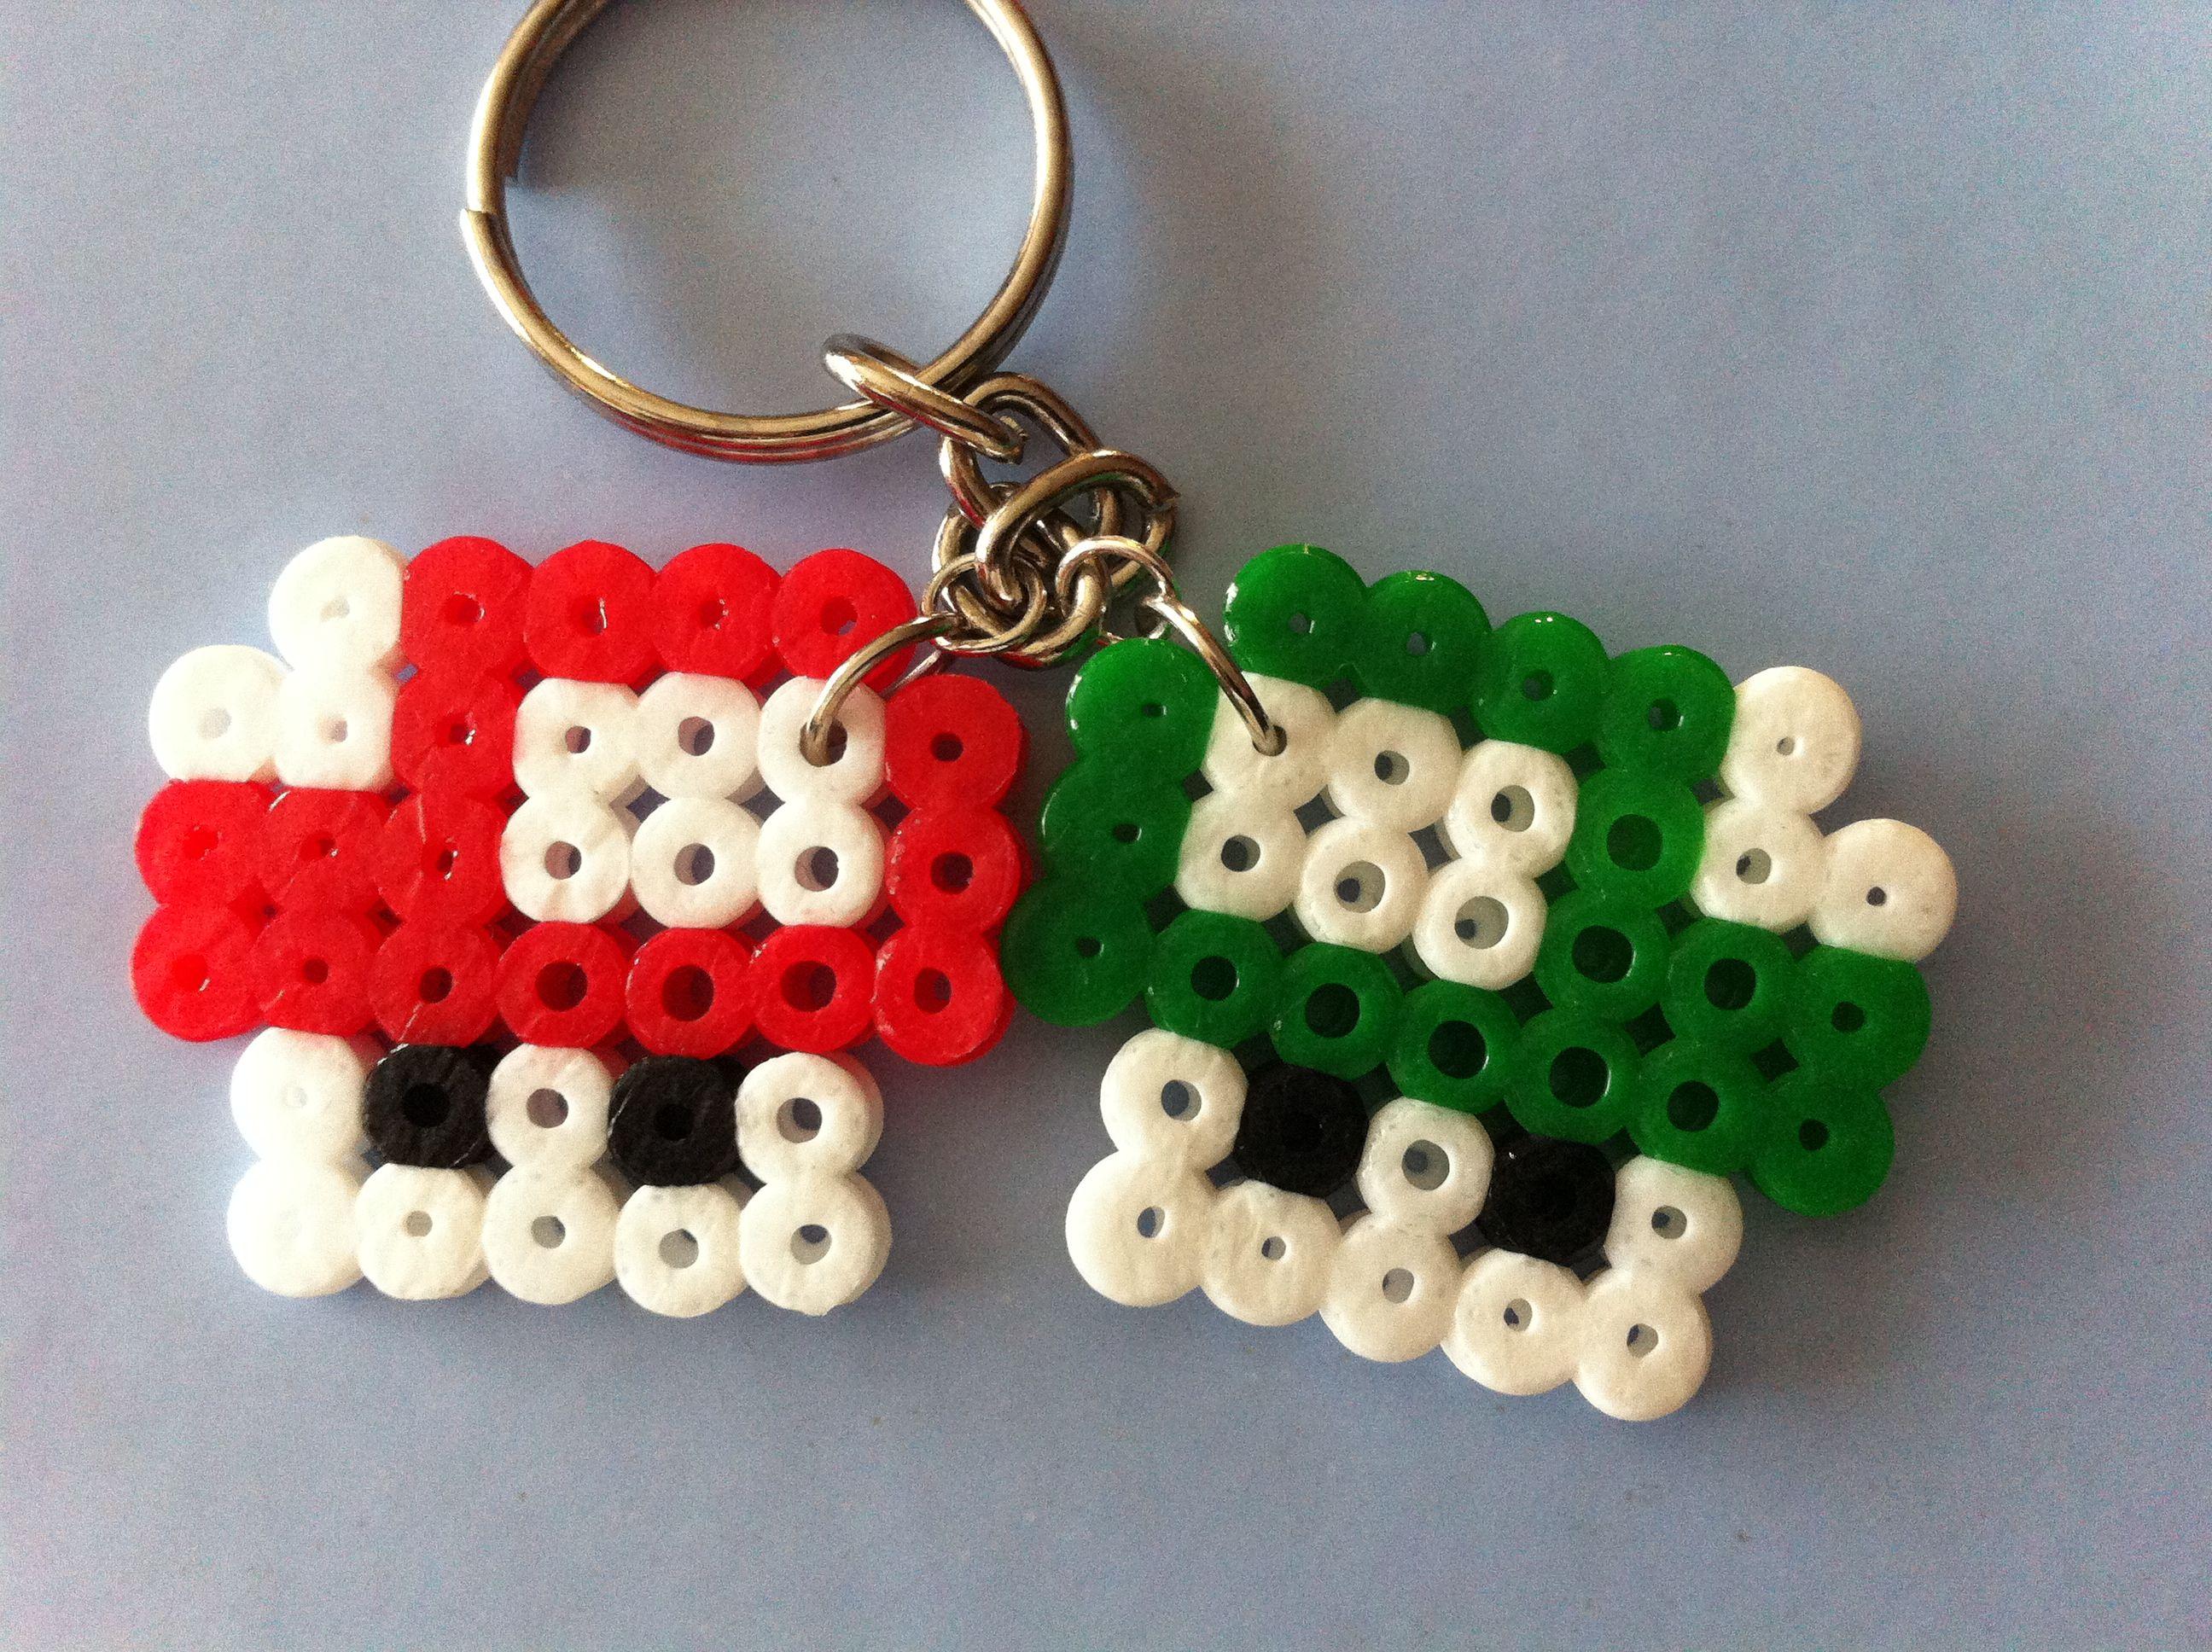 Friki Hama Beads Sacar El Patrón Es Super Fácil Hama Beads Beads Personalized Items